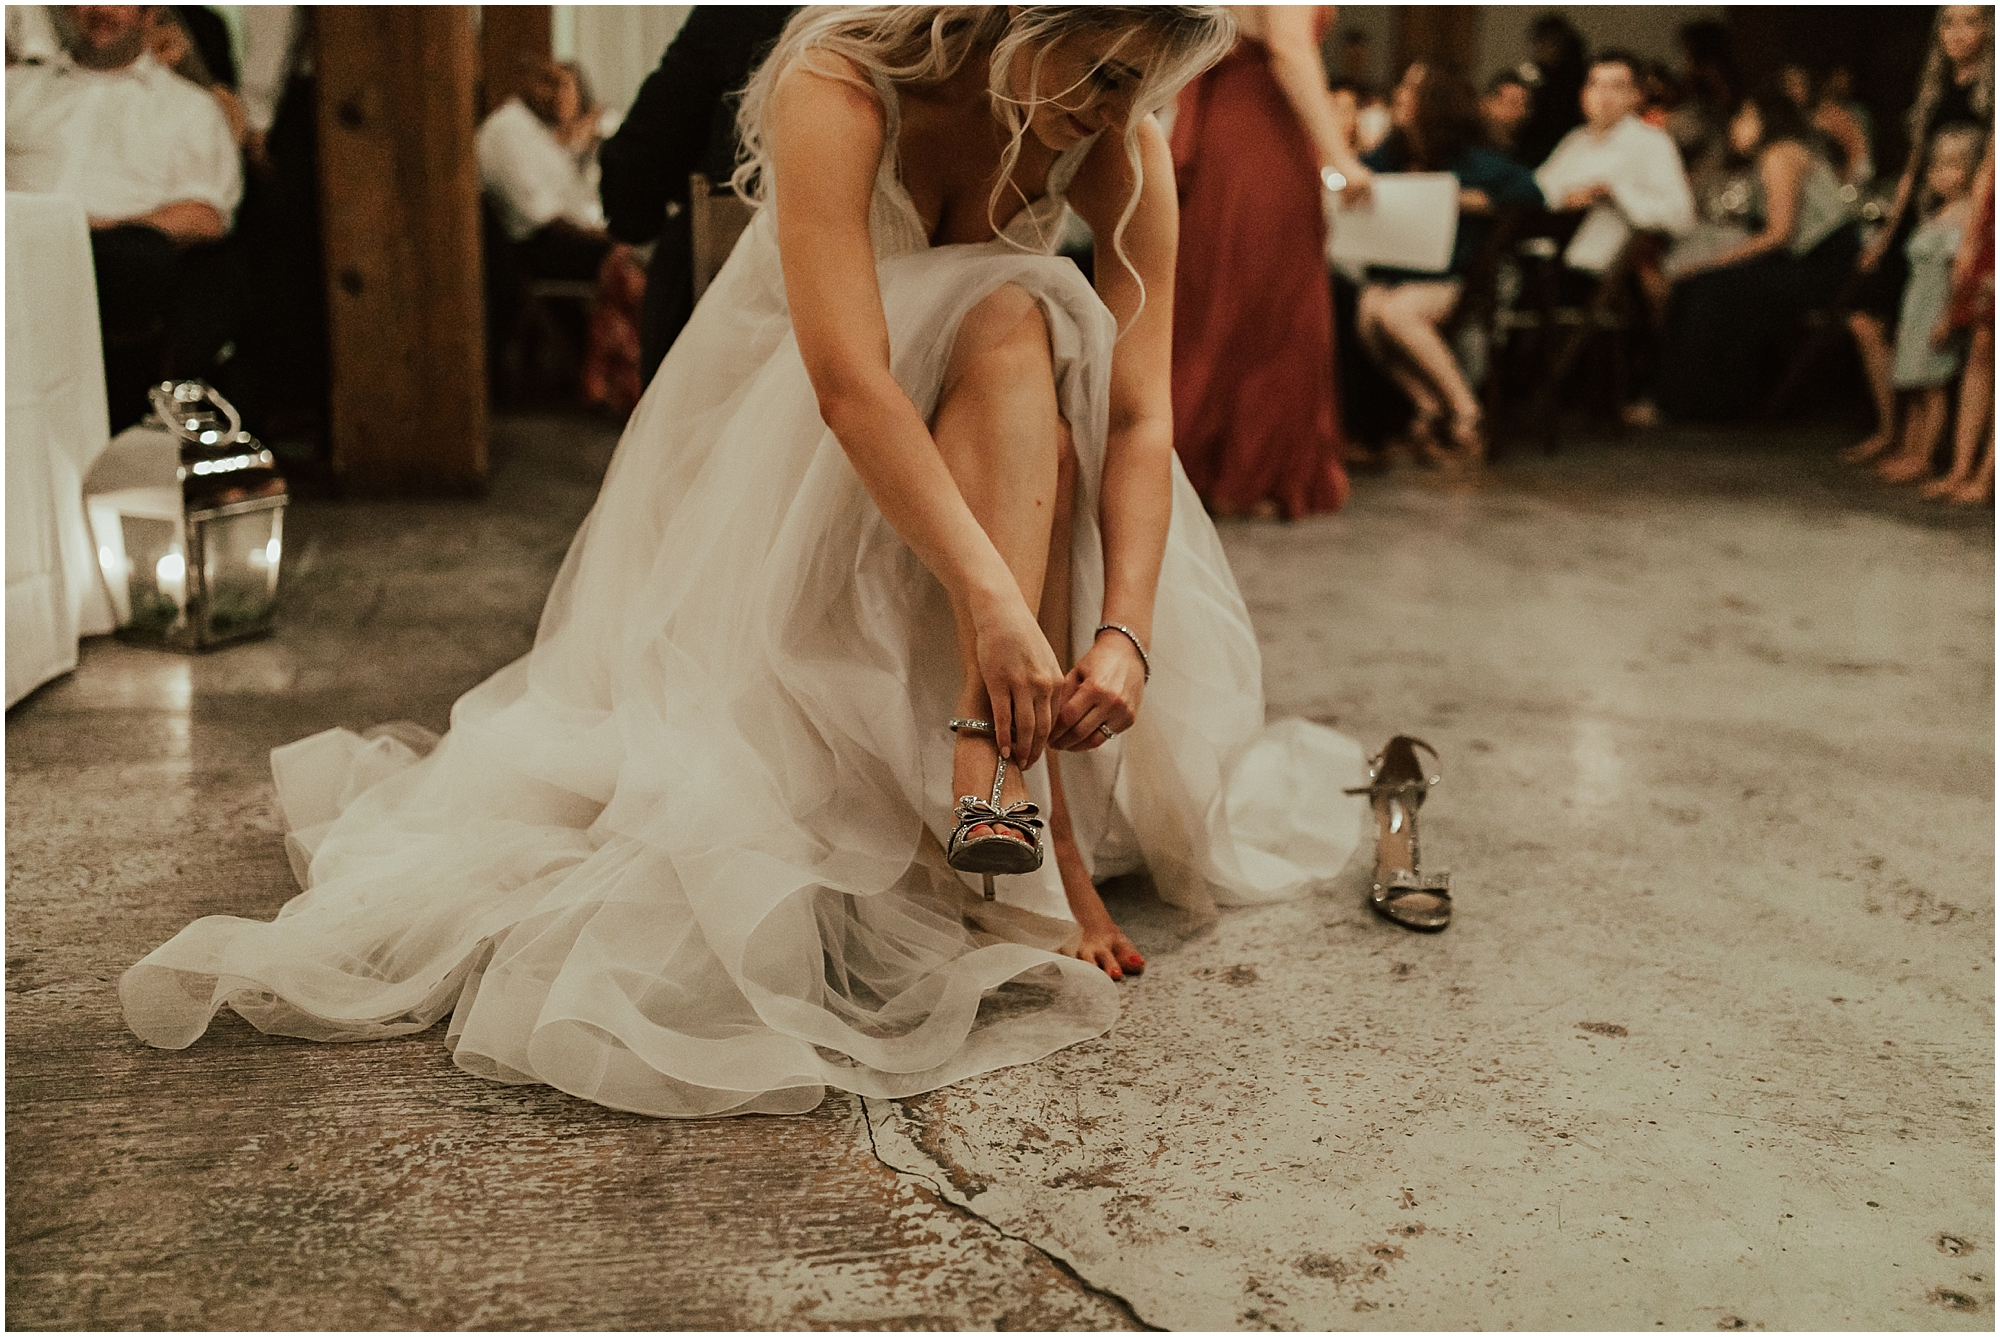 Chateau Rive Spokane Wedding Cassie Trottier Photography1160.jpg